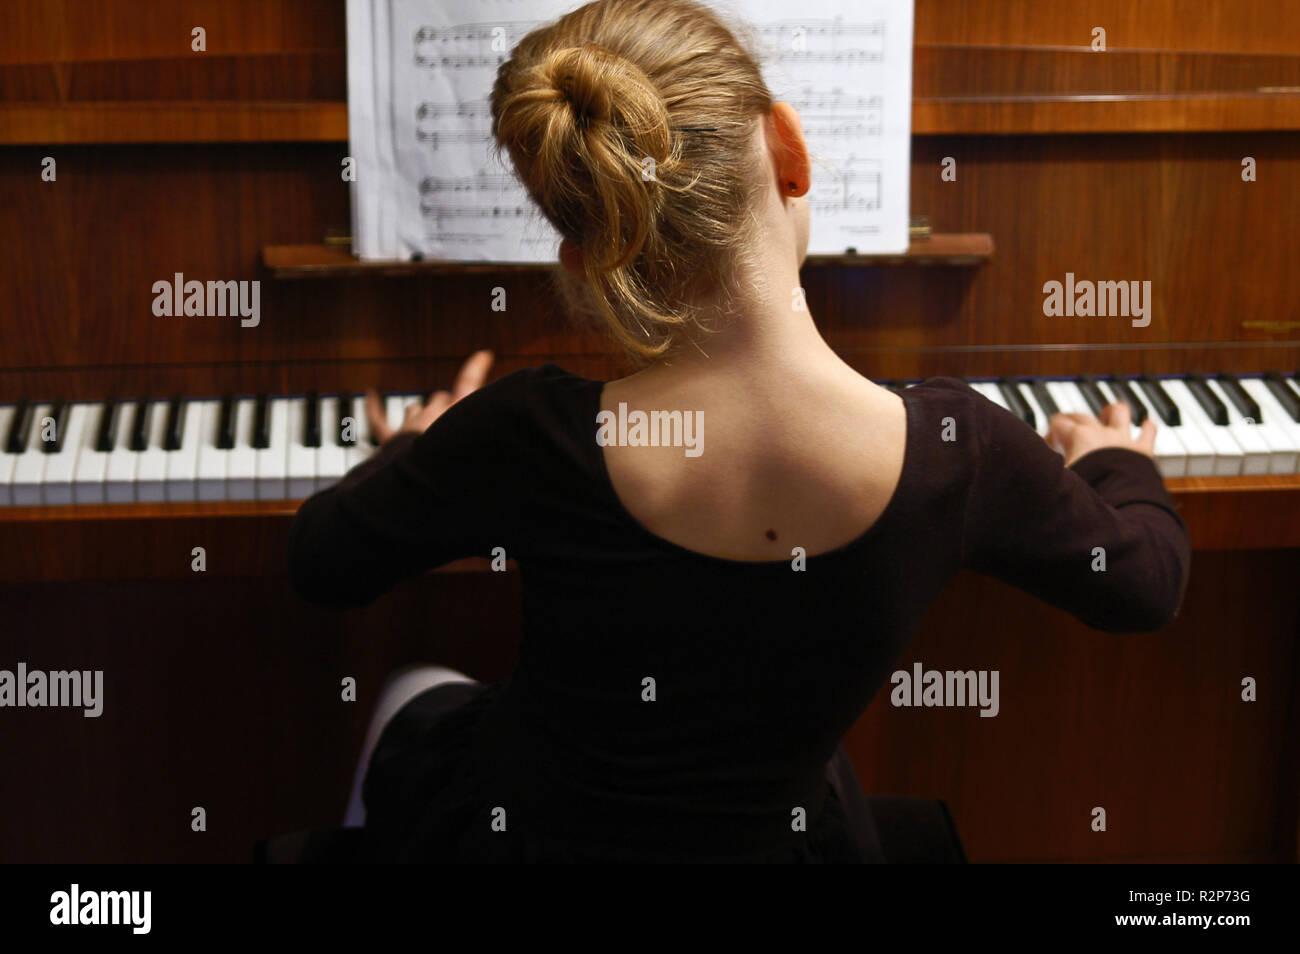 play piano - Stock Image